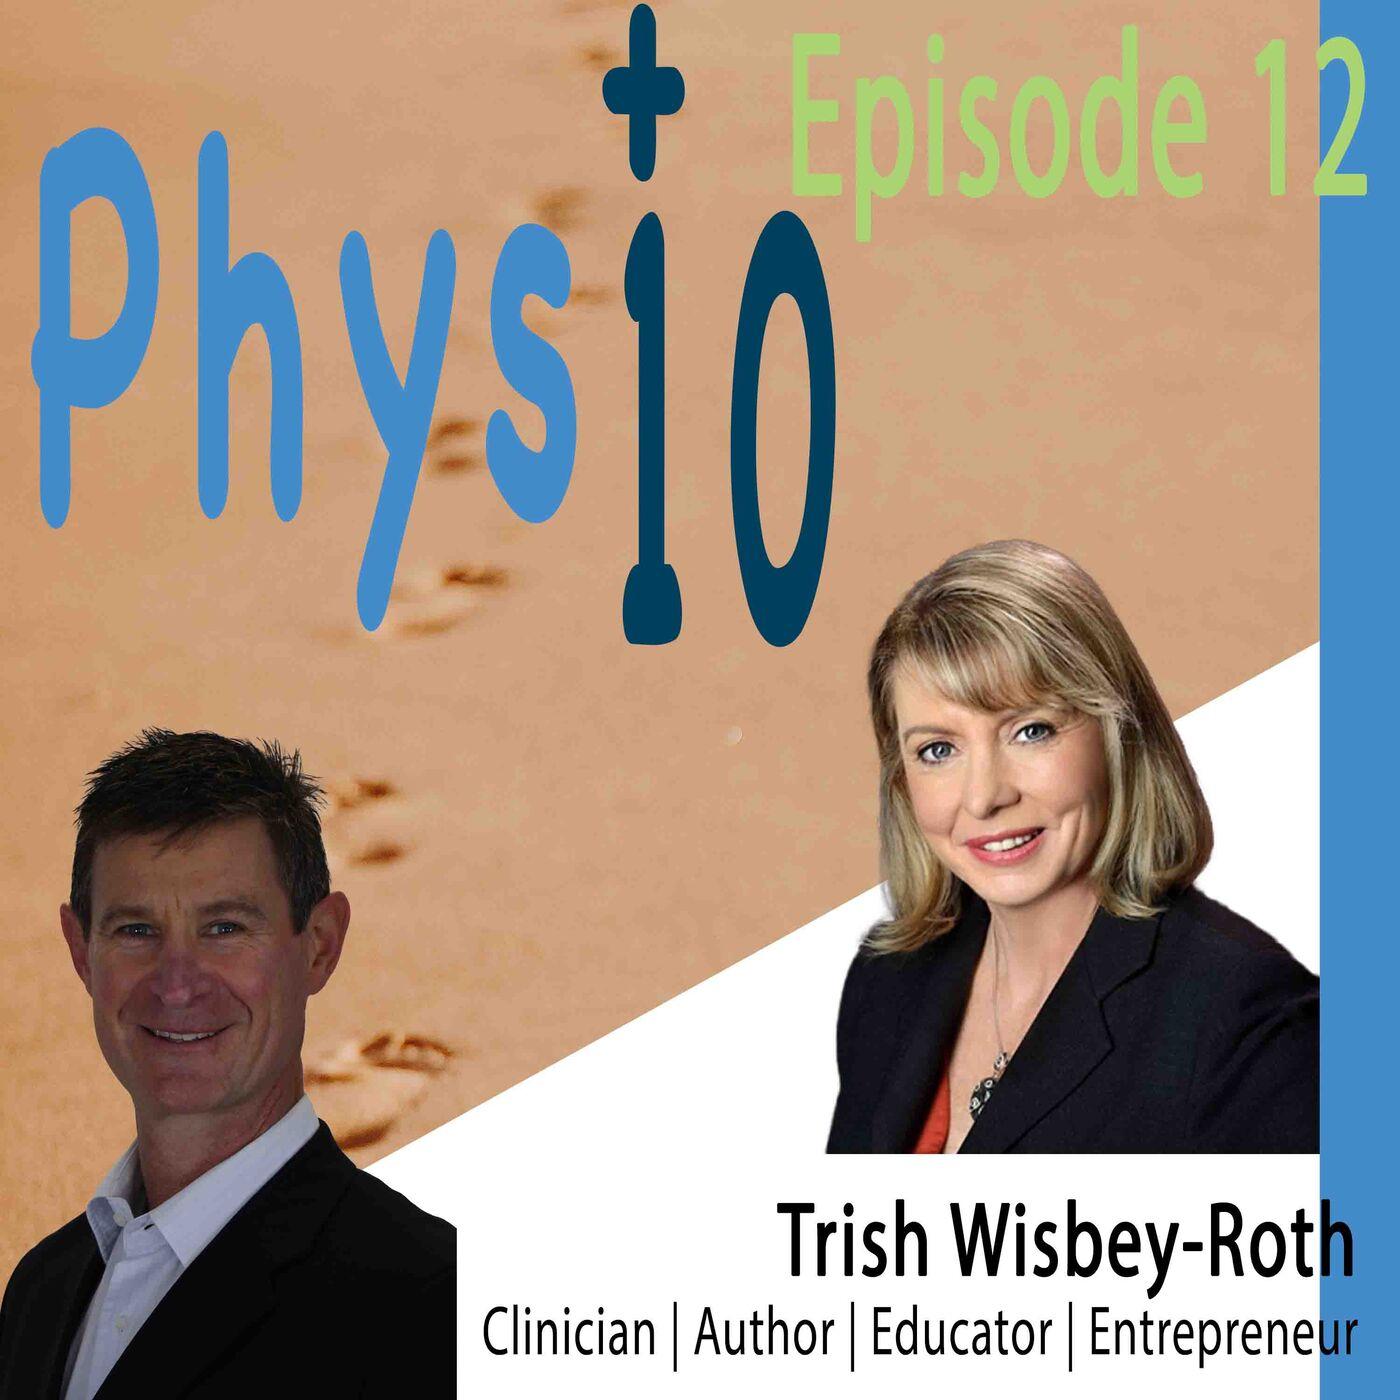 Trish Wisbey-Roth Clinician | Educator | Entrepreneur